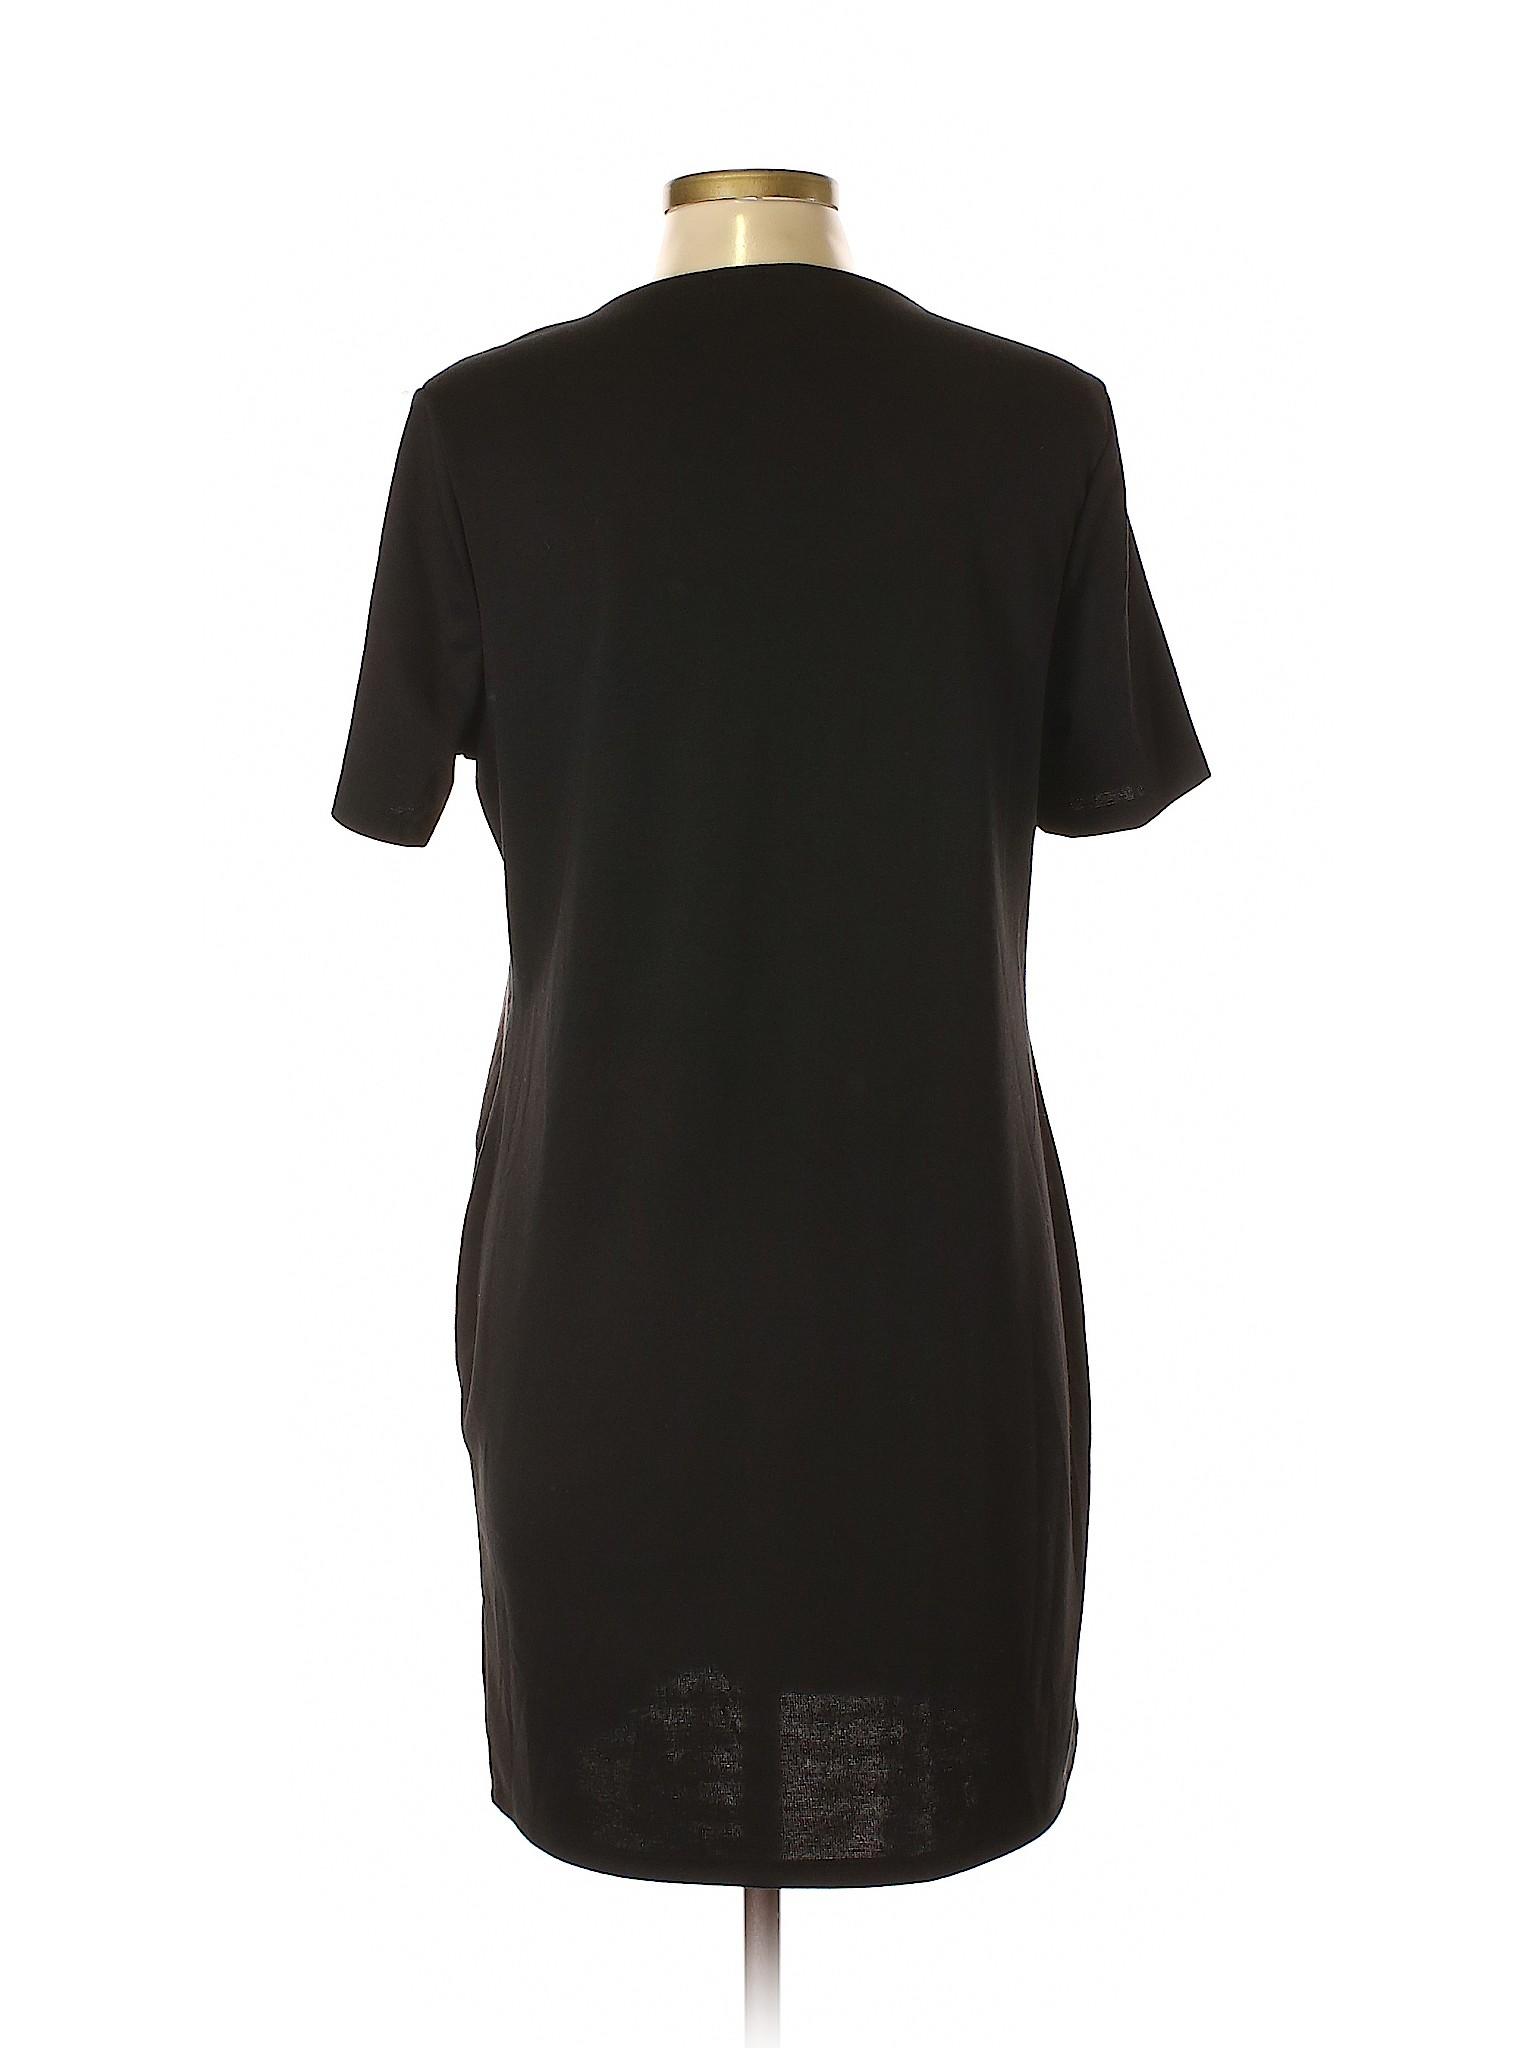 Dress Boutique Boutique winter Atmosphere winter Casual n6wTqzvXx